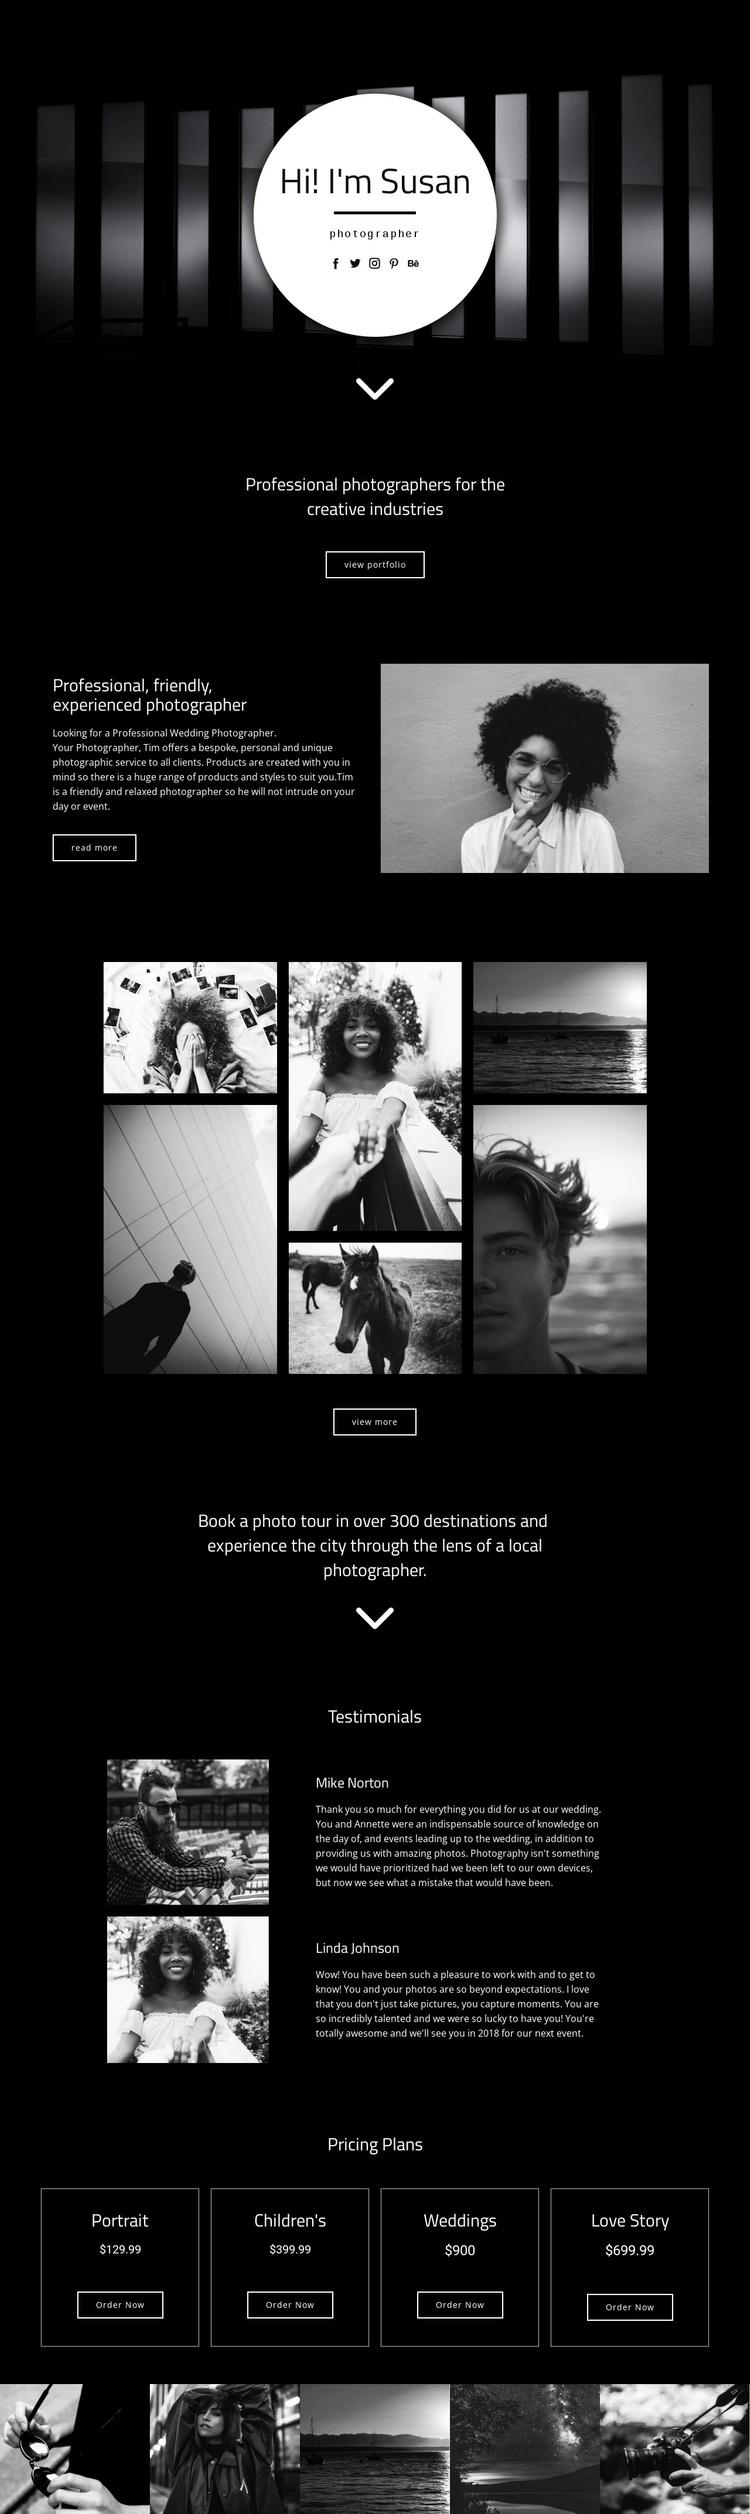 Your Photographer Website Builder Software